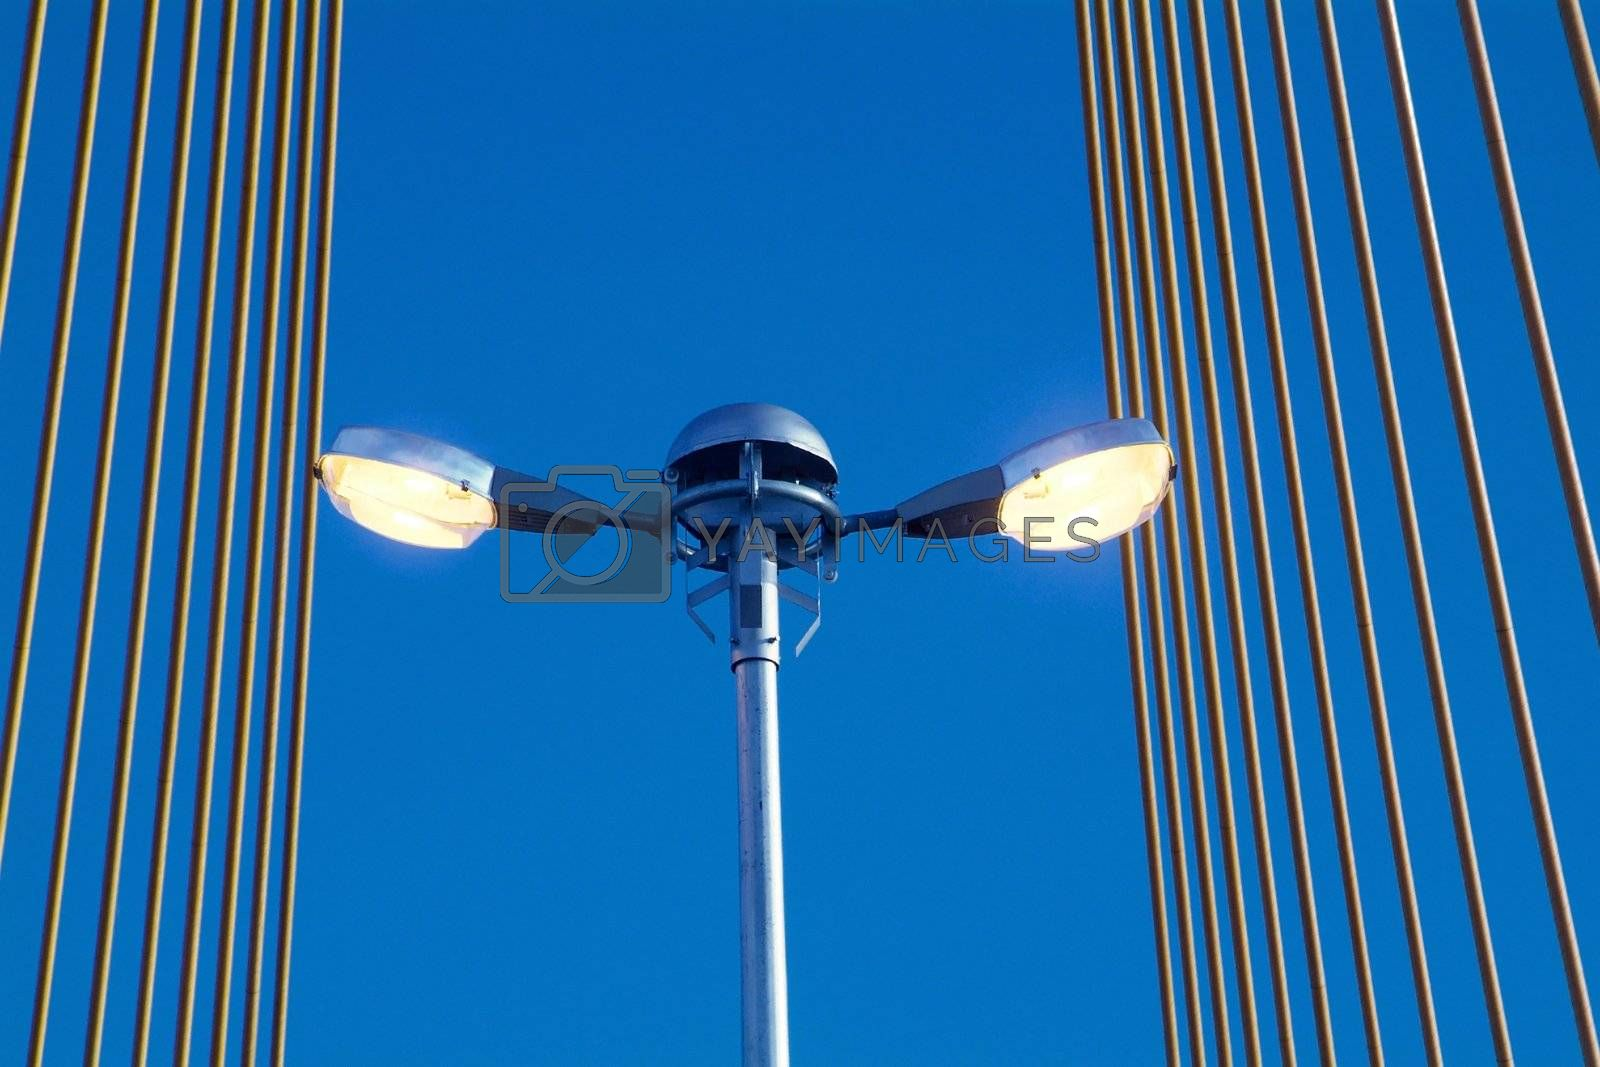 Royalty free image of Street light on bridge by epixx